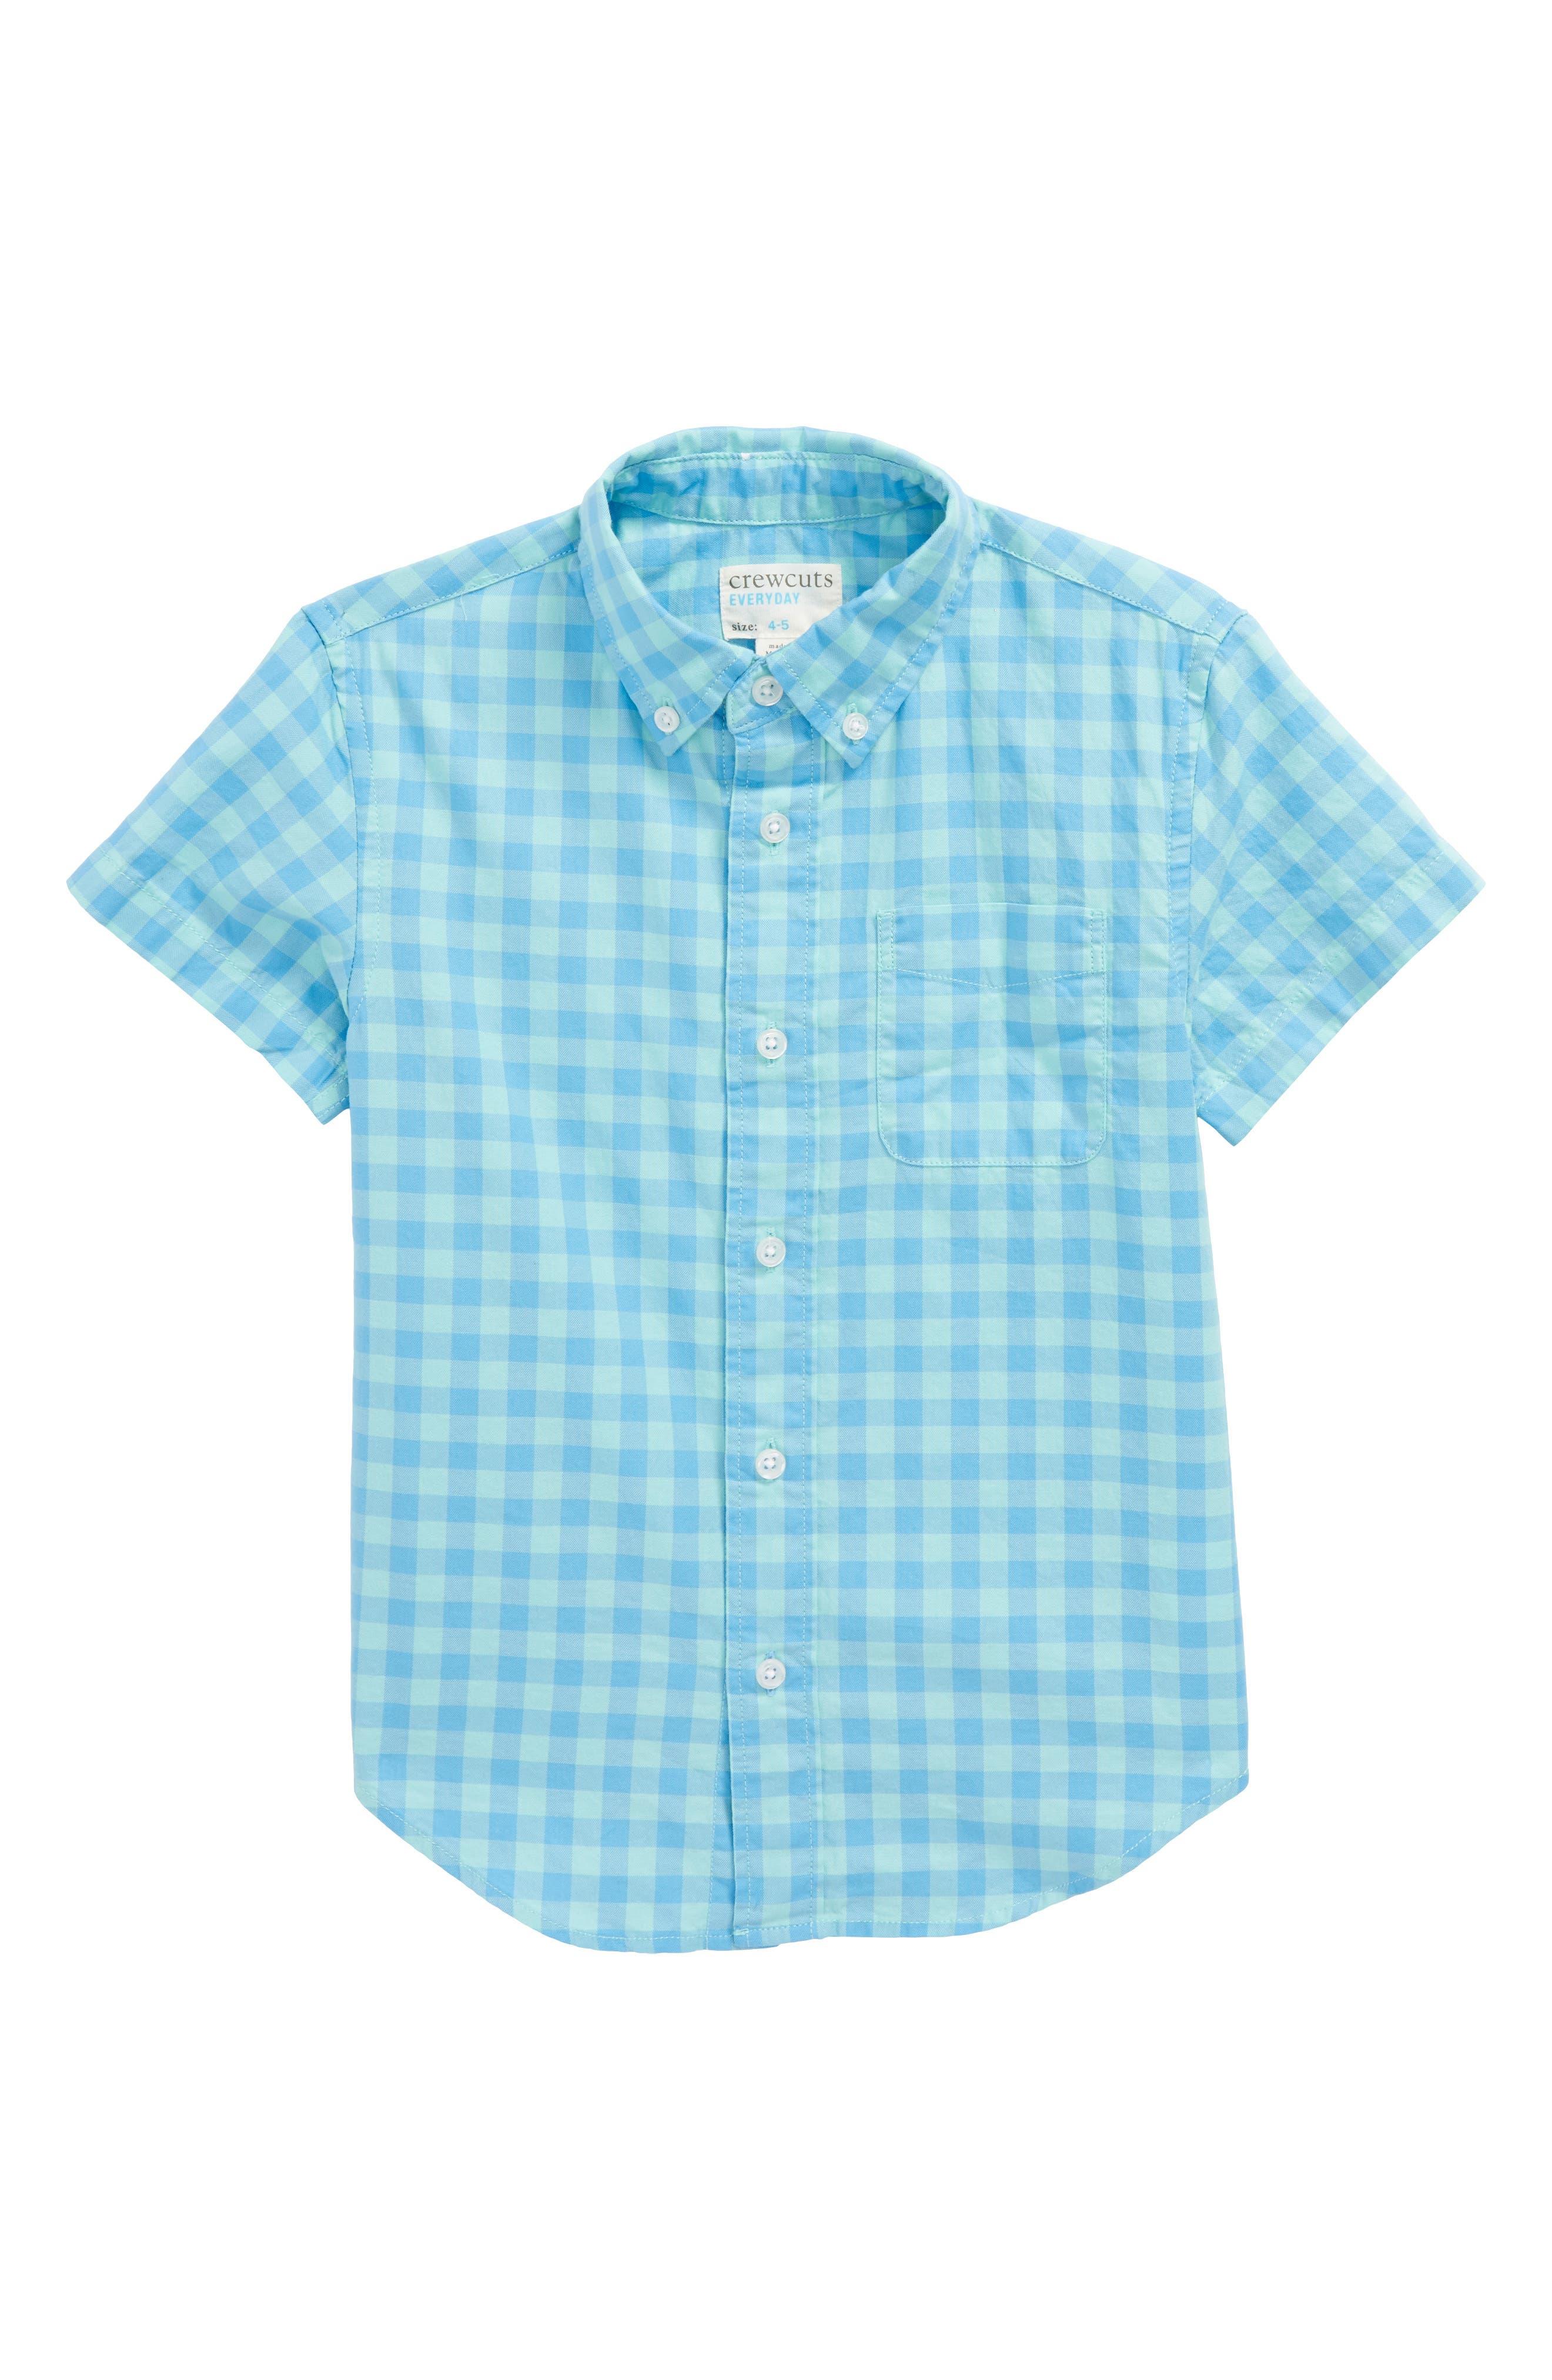 crewcuts by J.Crew Milton Gingham Check Woven Shirt (Toddler Boys, Little Boys & Big Boys)